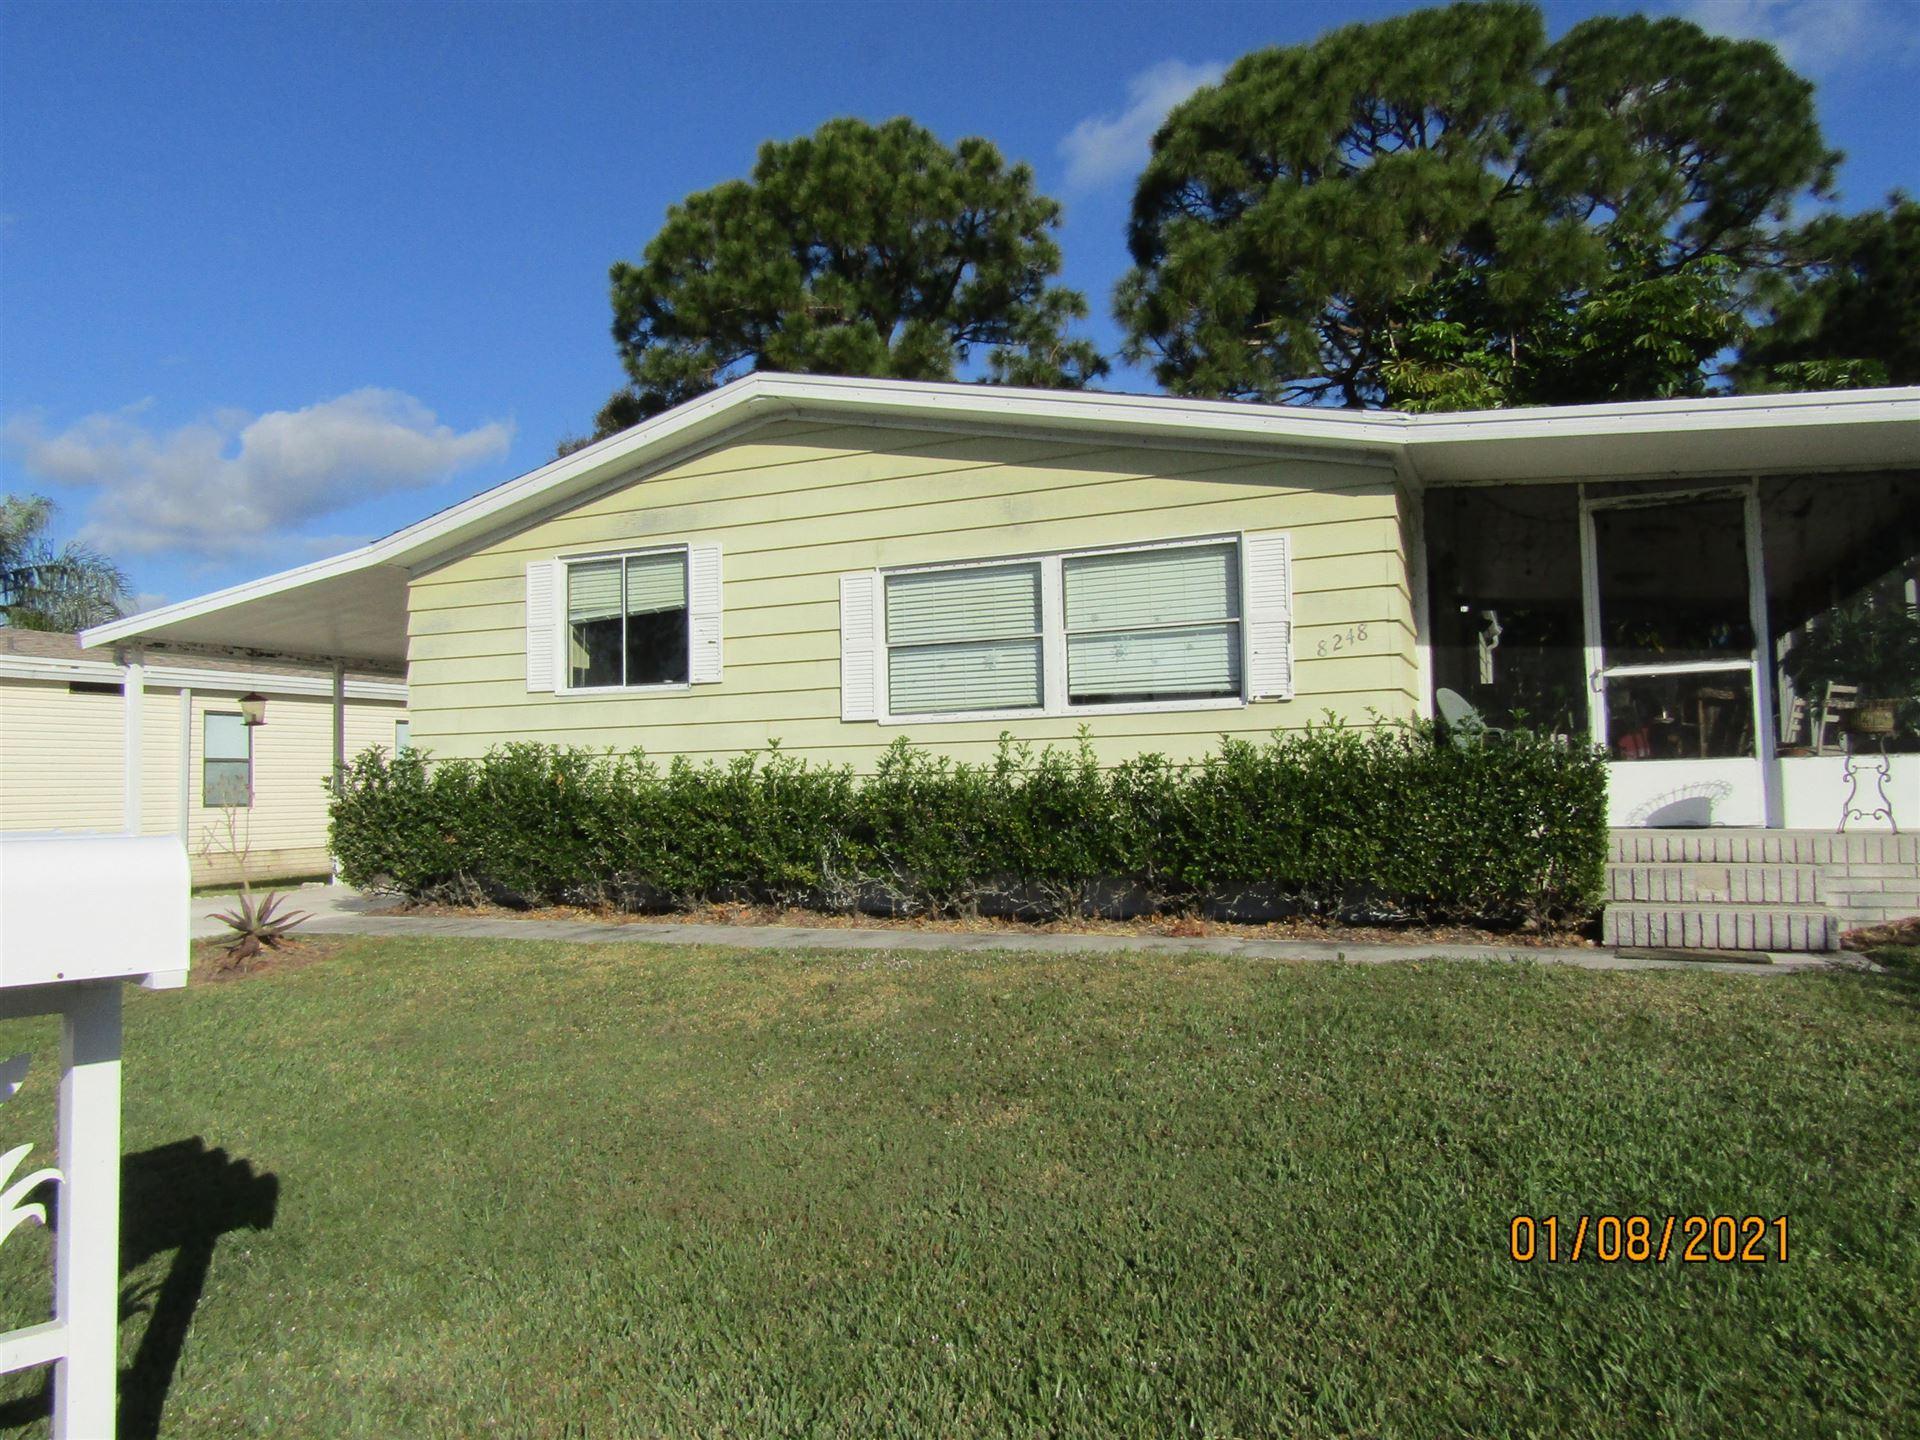 8248 Cinnamon Court, Port Saint Lucie, FL 34952 - MLS#: RX-10683140